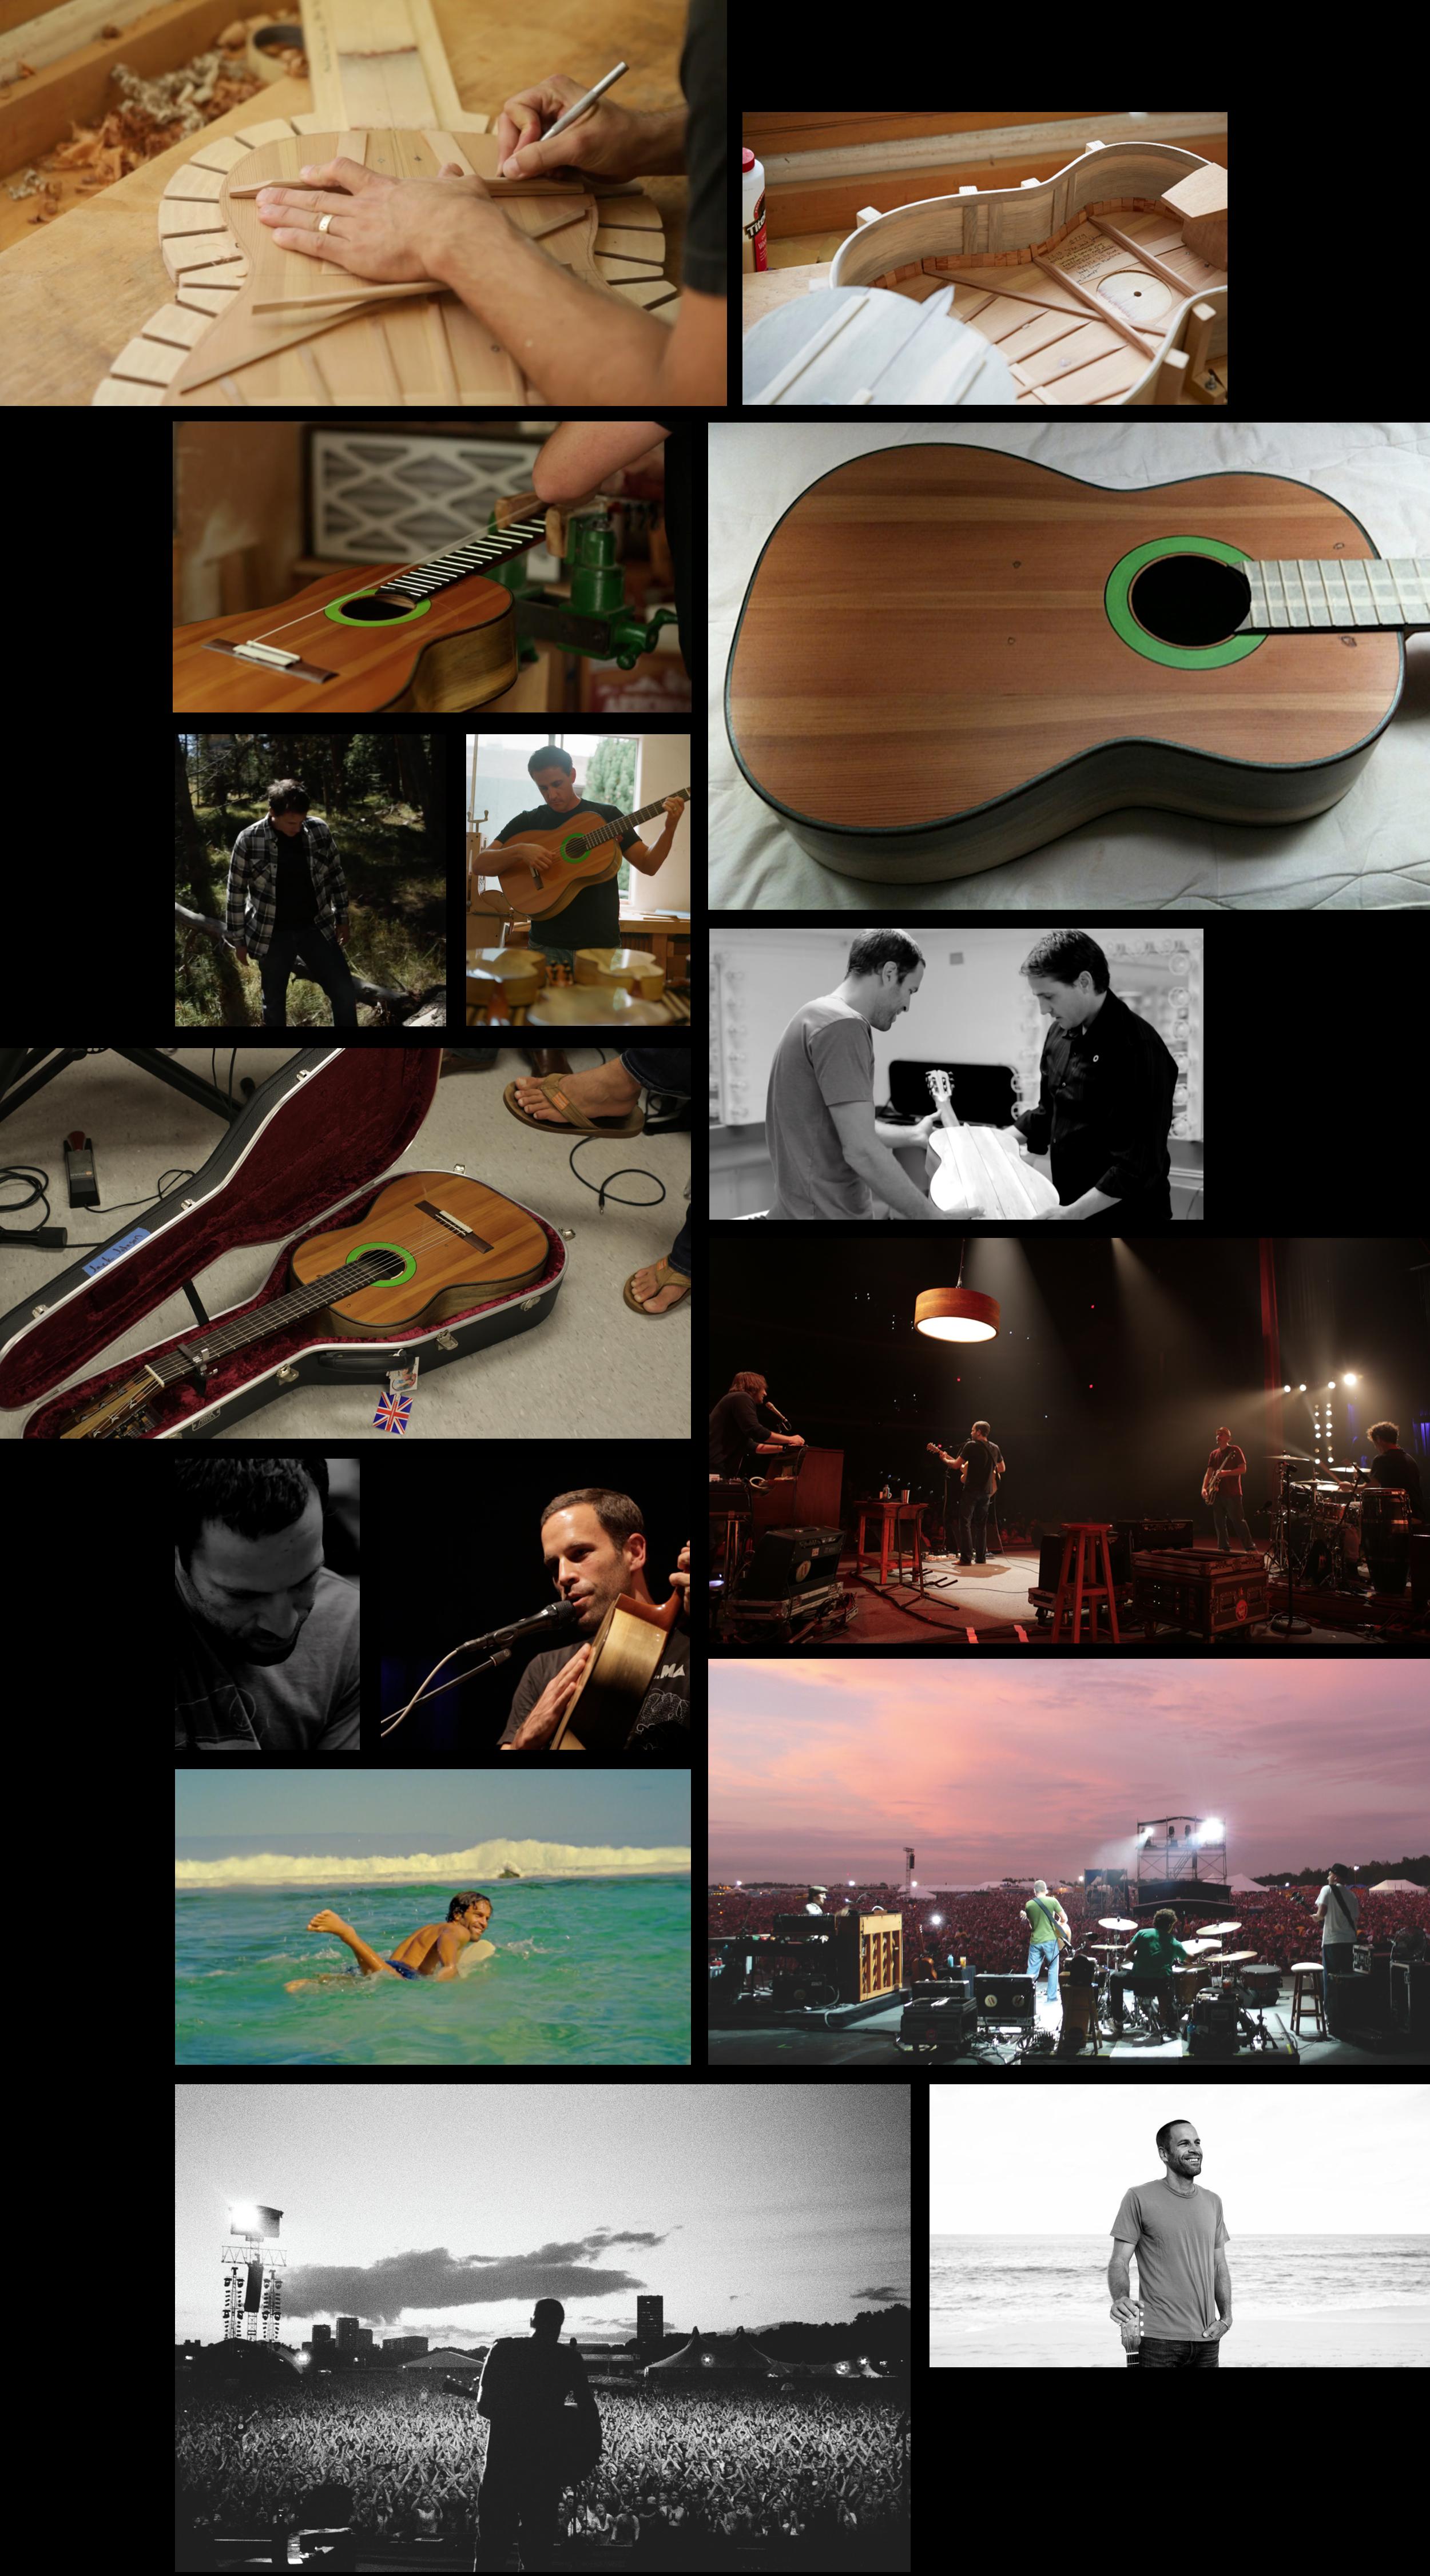 jack_johnson_collage_studio_lo_2.png